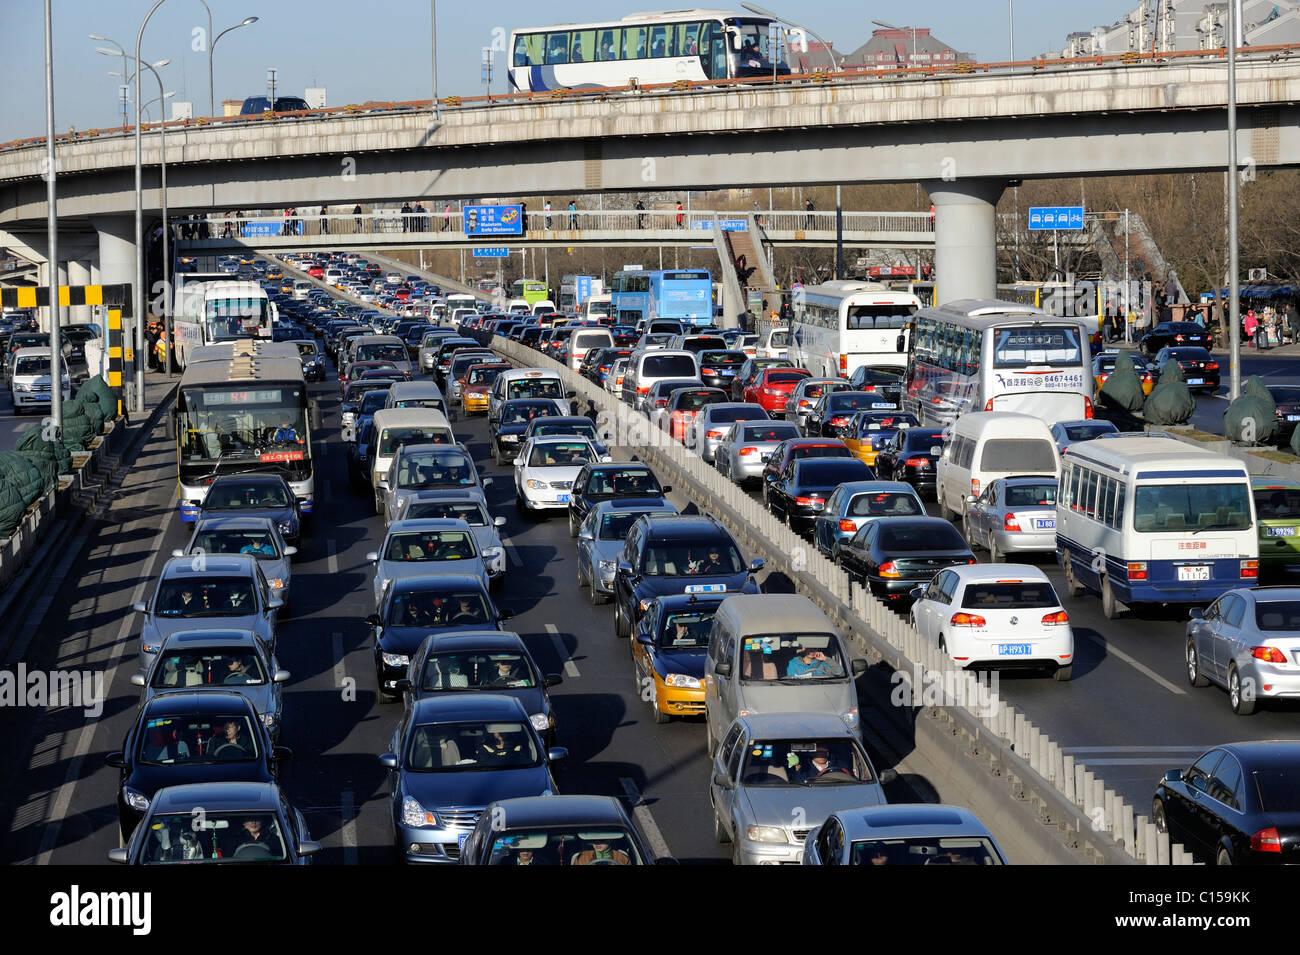 Congested traffic on Beijing motorway, China. 09-Mar-2011 - Stock Image